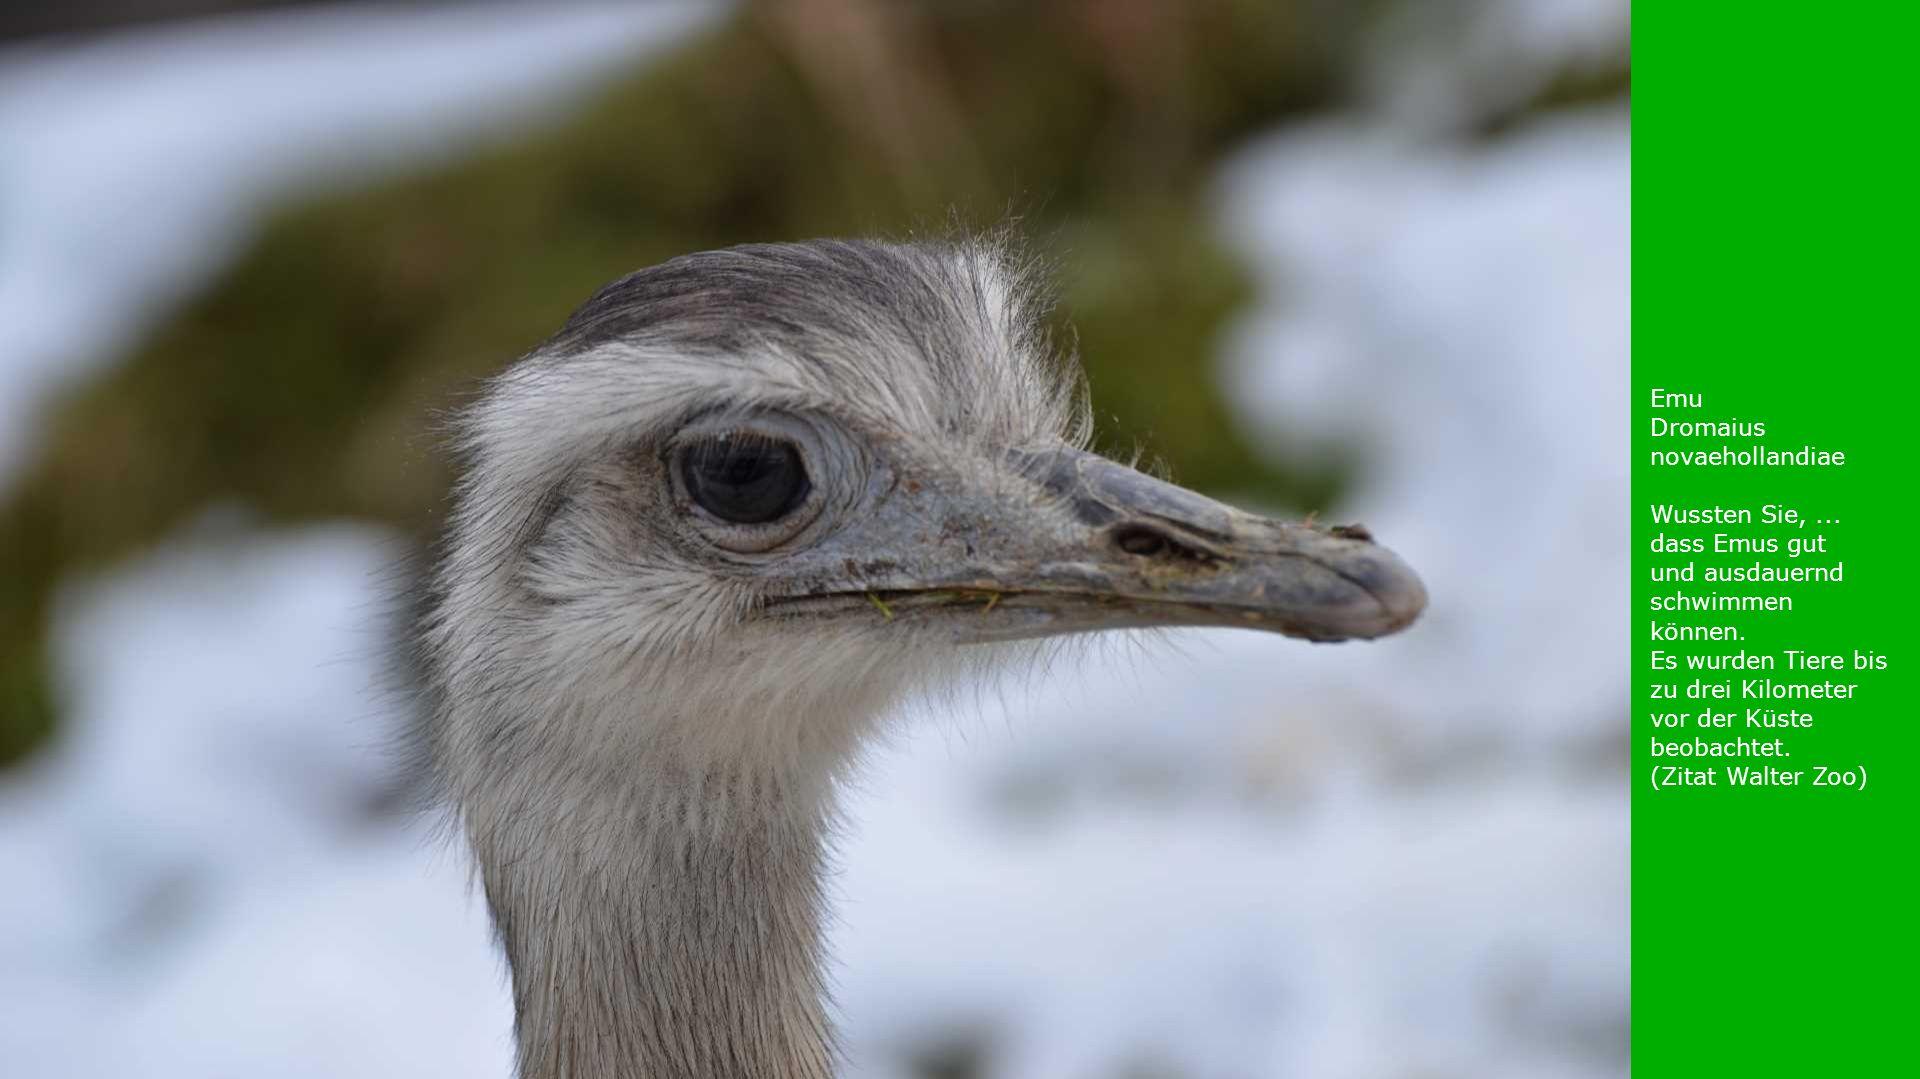 Emu Dromaius novaehollandiae. Wussten Sie, ...